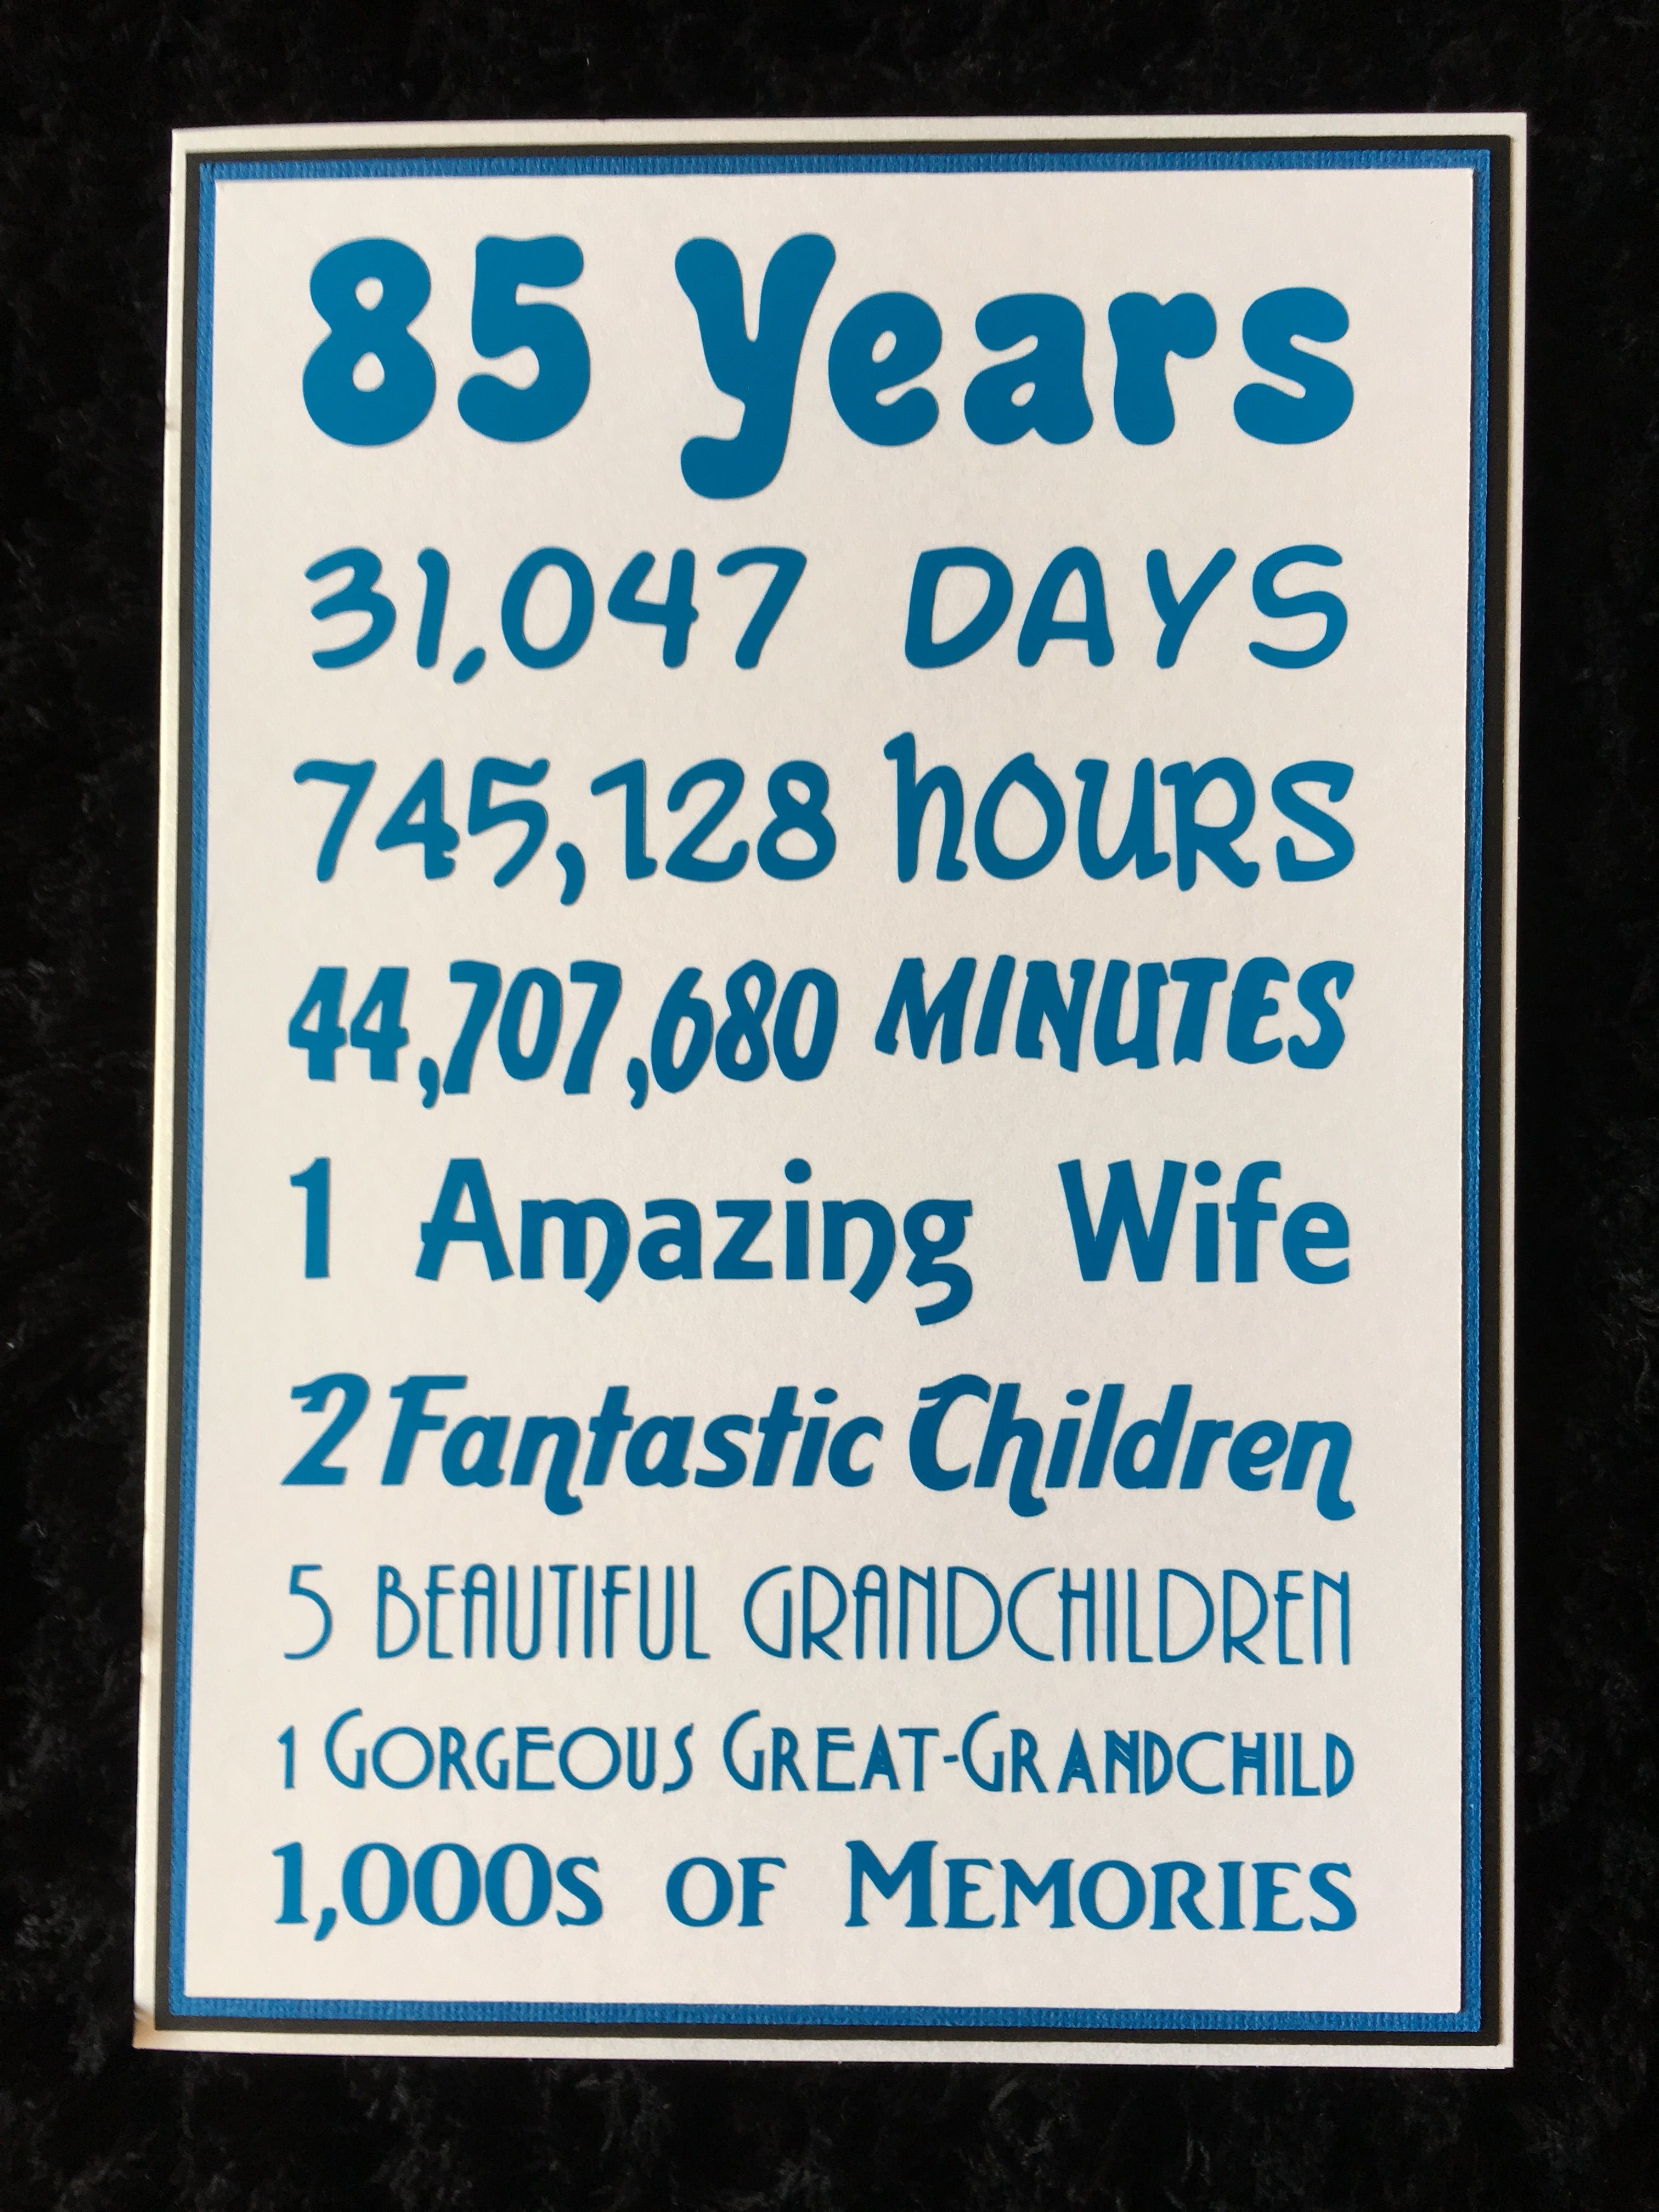 Personalized 85th Birthday Chalkboard Poster Design by JJsDesignz – 85th Birthday Cards